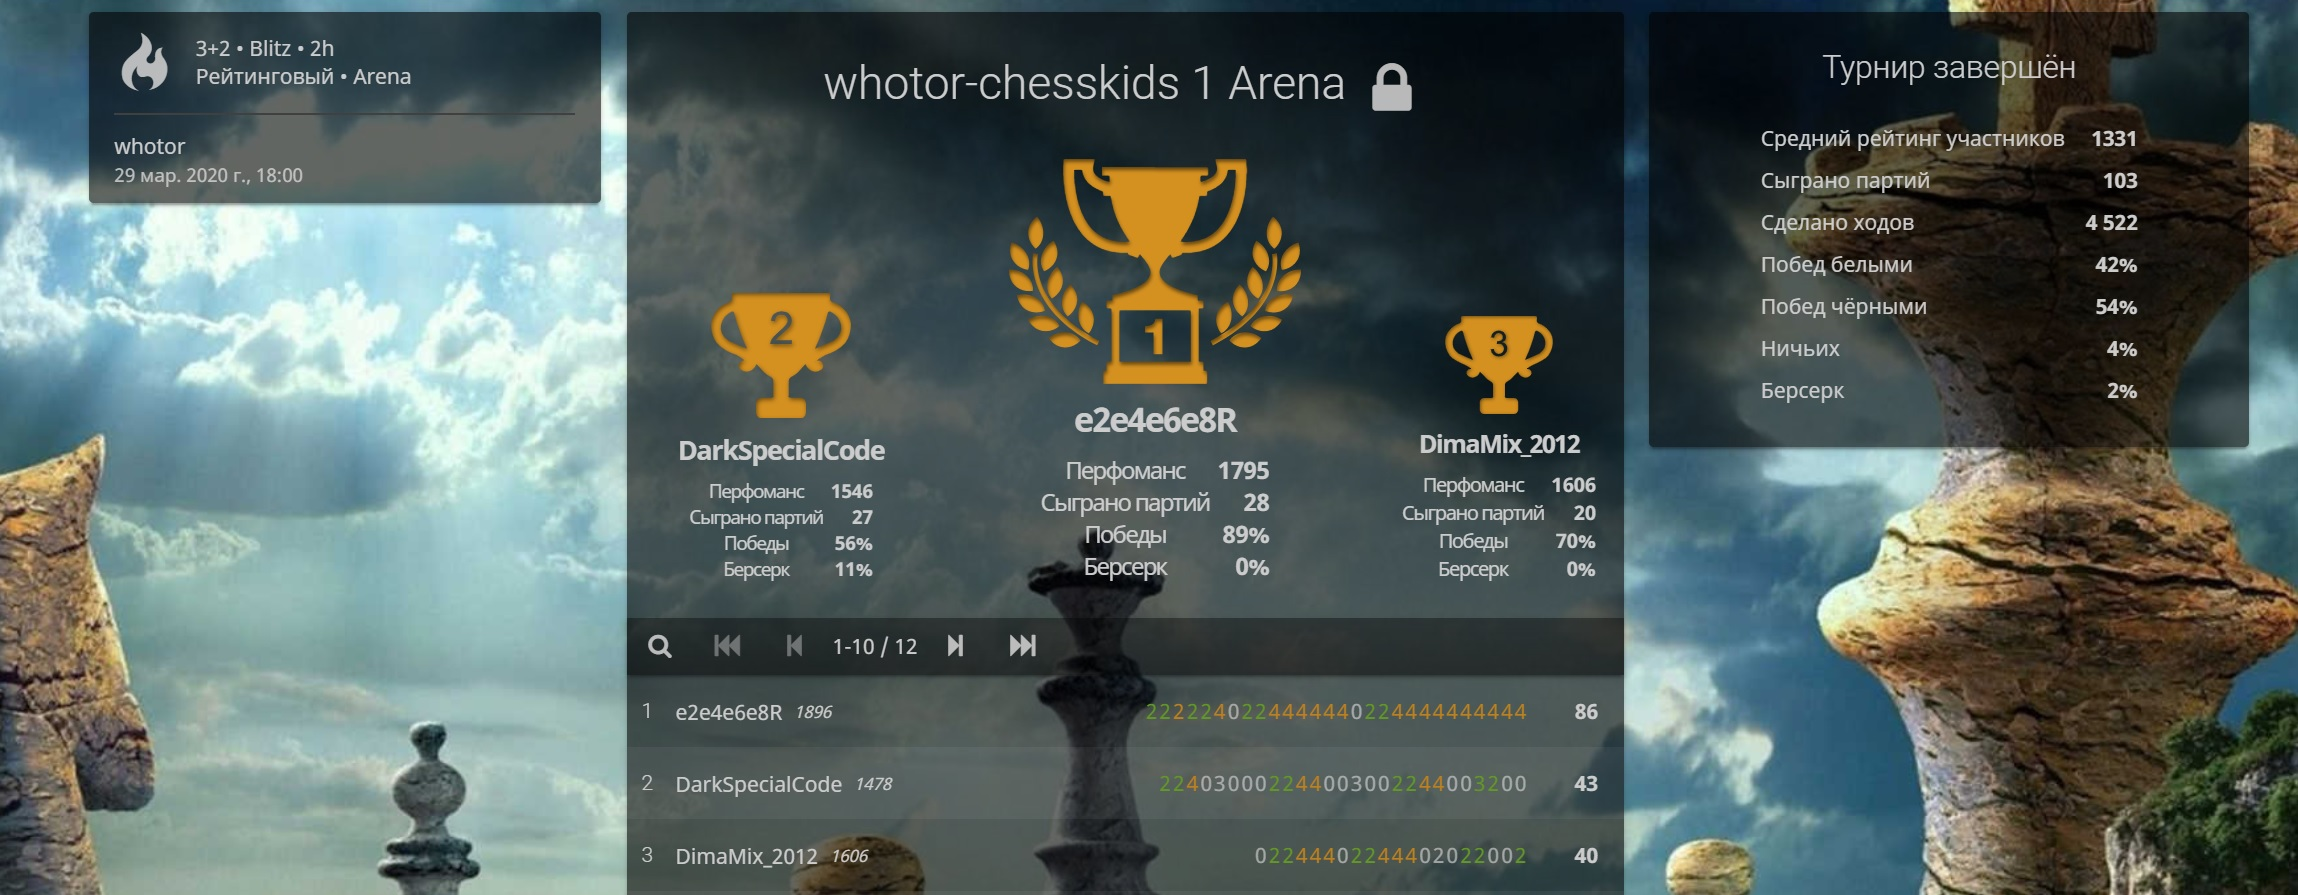 Разбор партий Chesskids Arena 29.03.2020